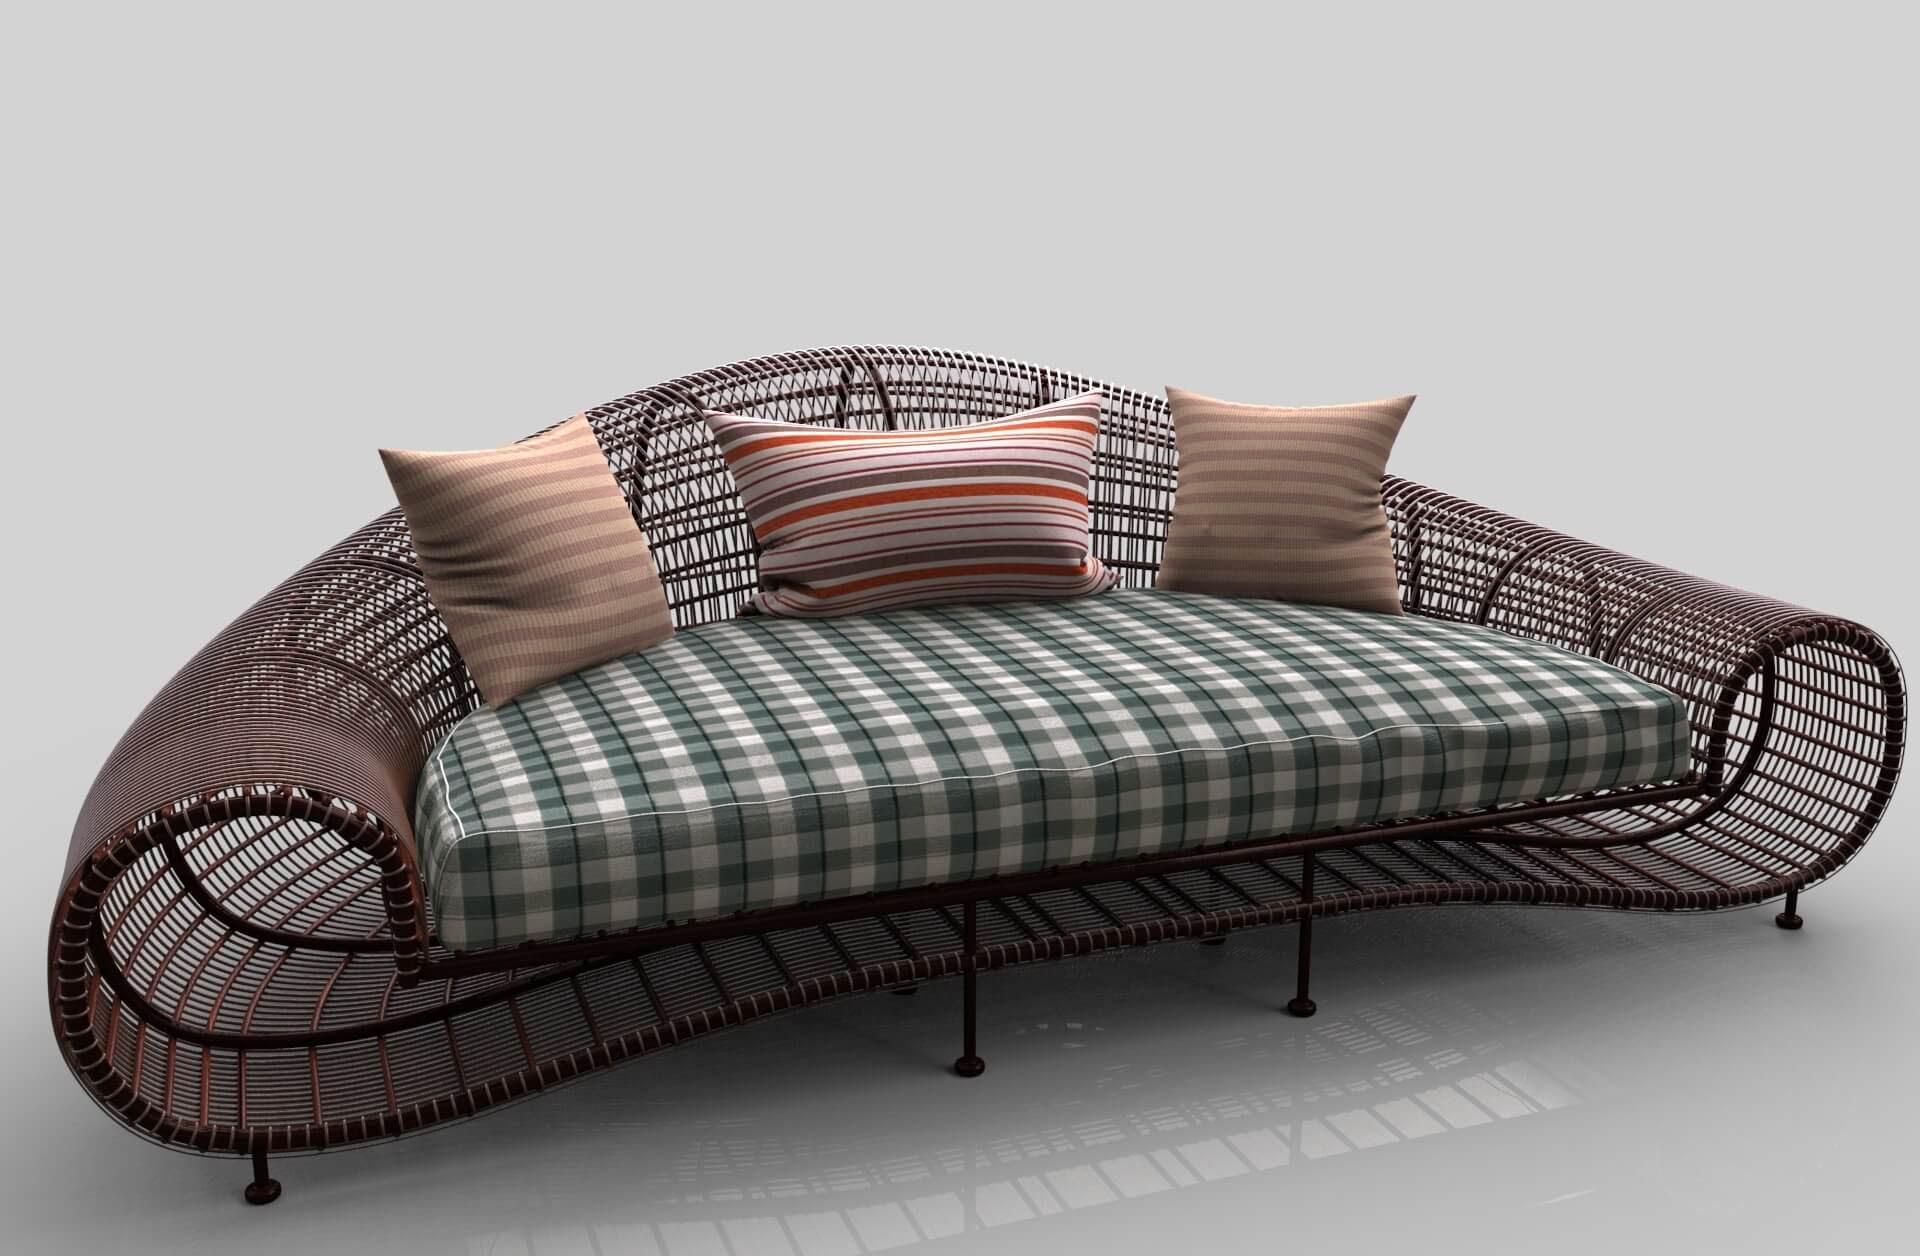 How to Shop for the Perfect Sofa - Interior Design, Design ...